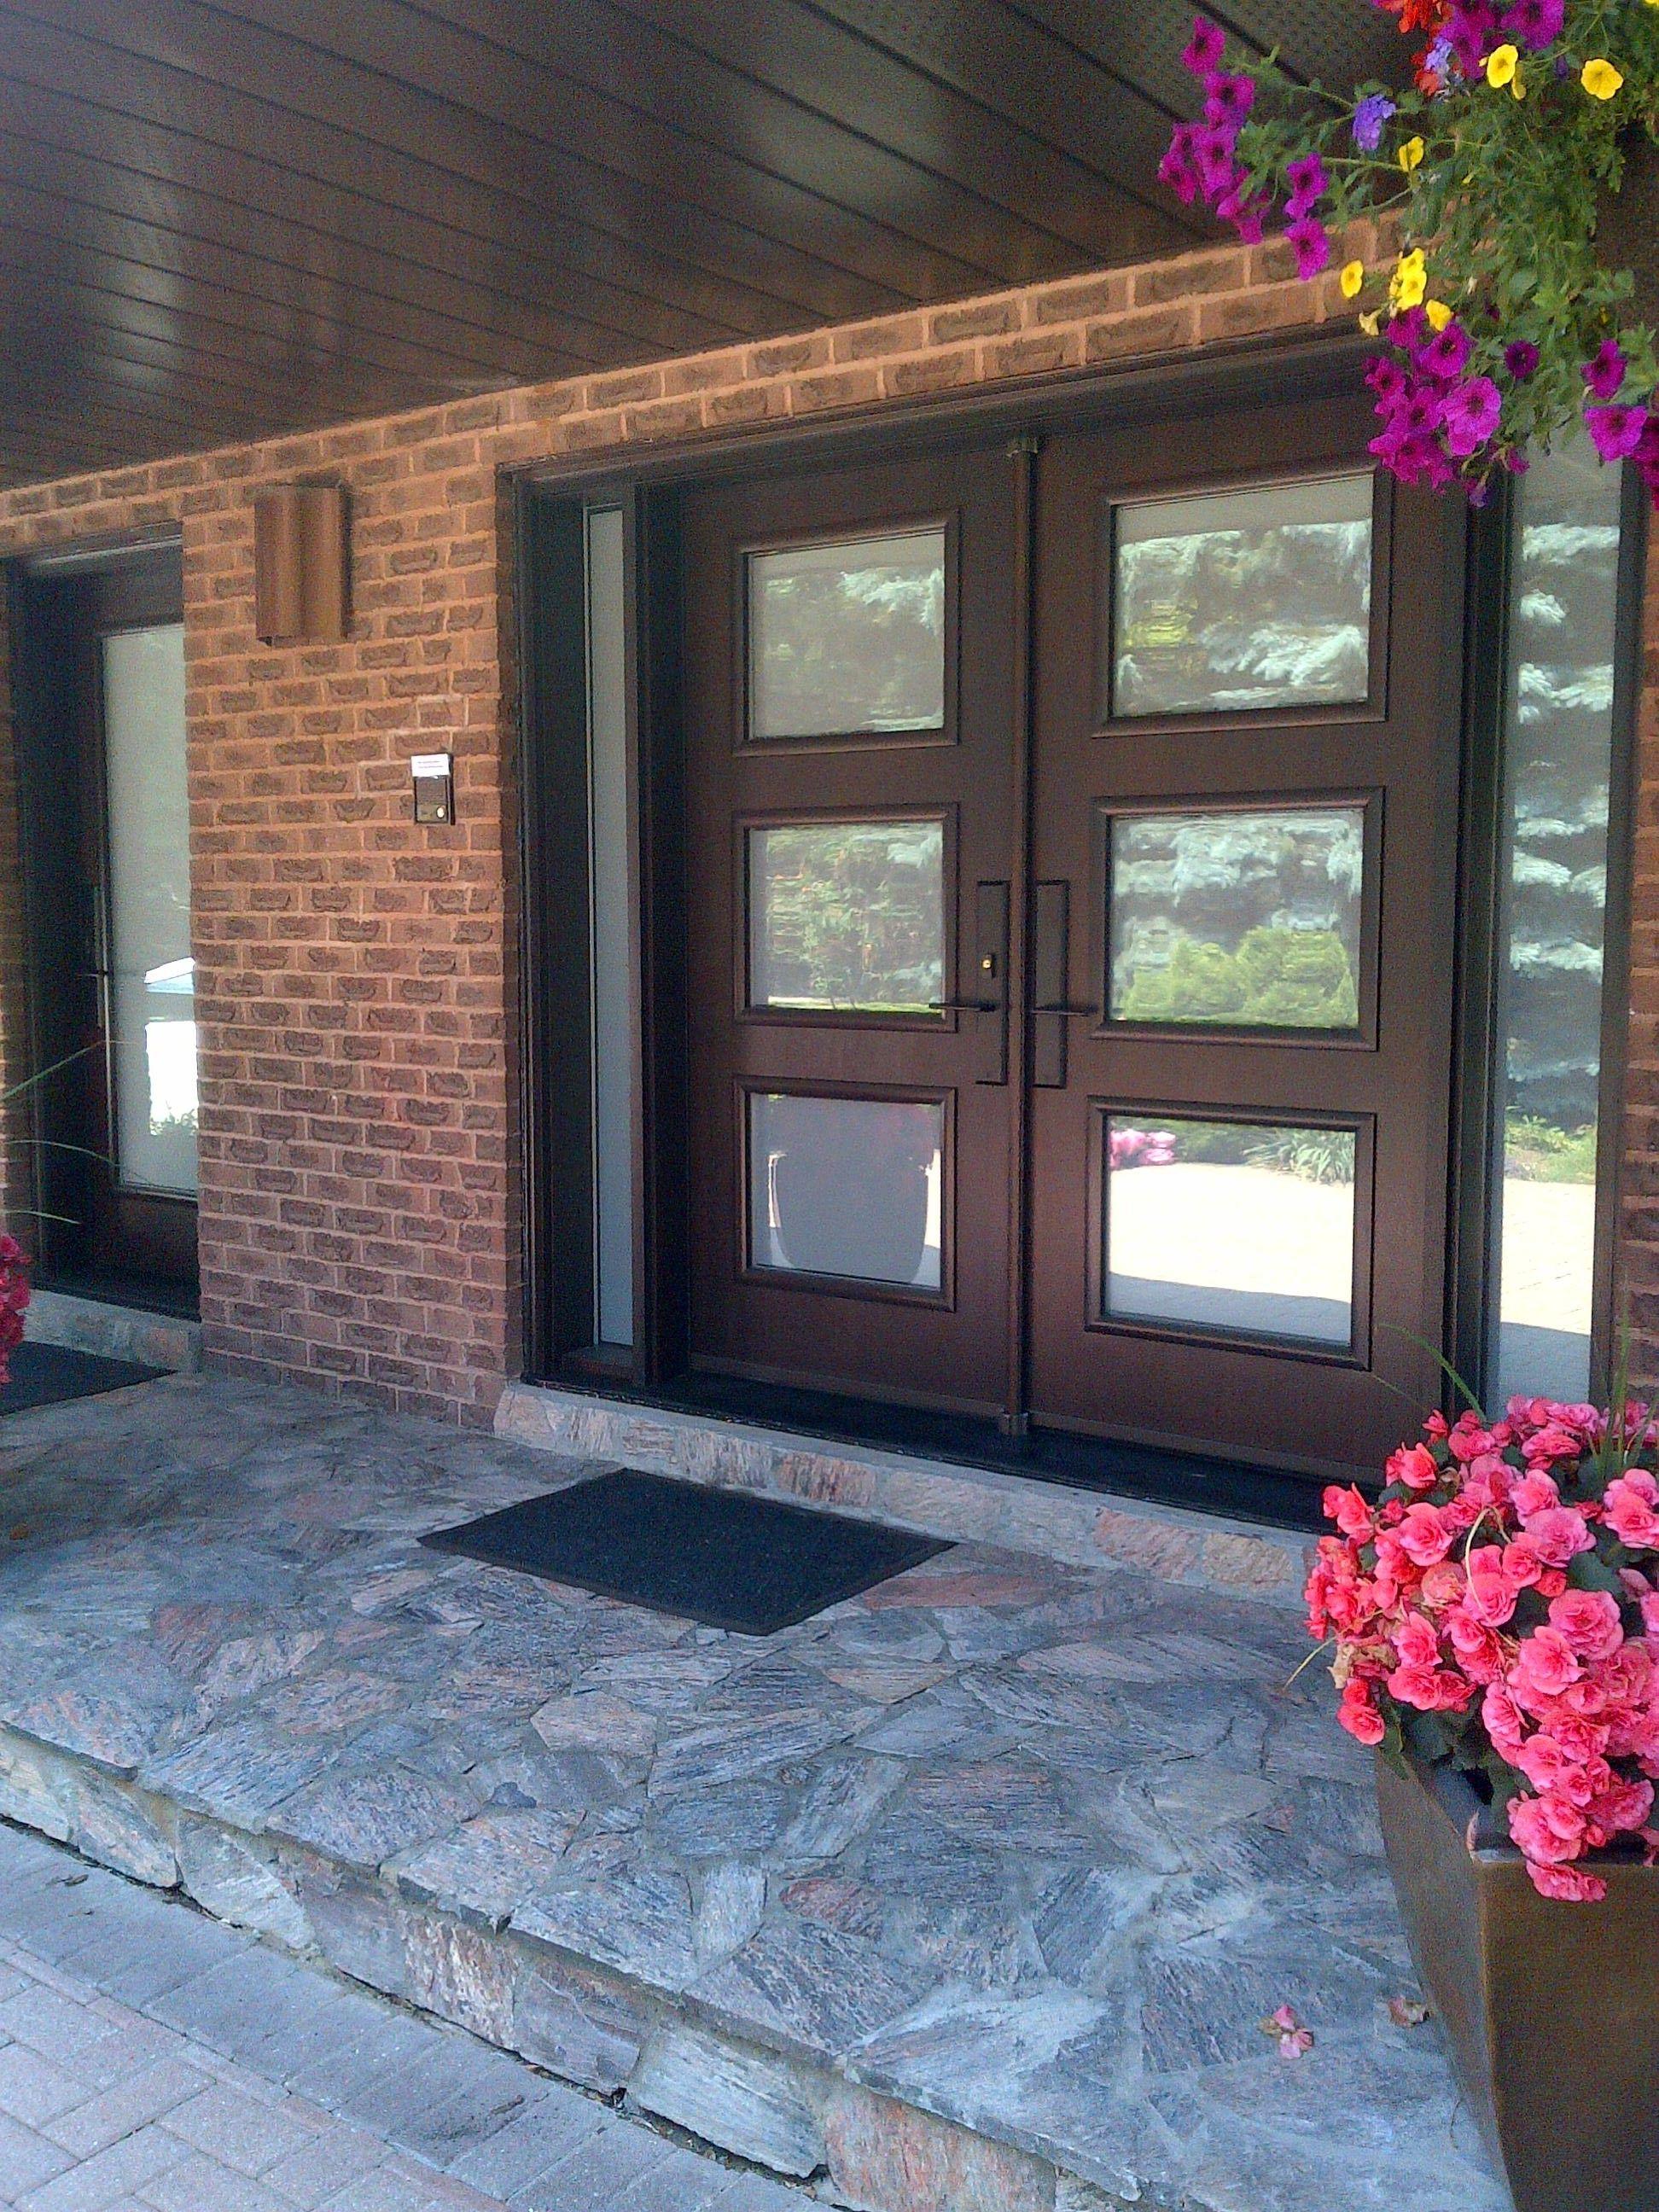 Updated exterior new fiberglass entry doors with custom glass updated exterior new fiberglass entry doors with custom glass sidelights homedecorwindowsanddoors planetlyrics Image collections